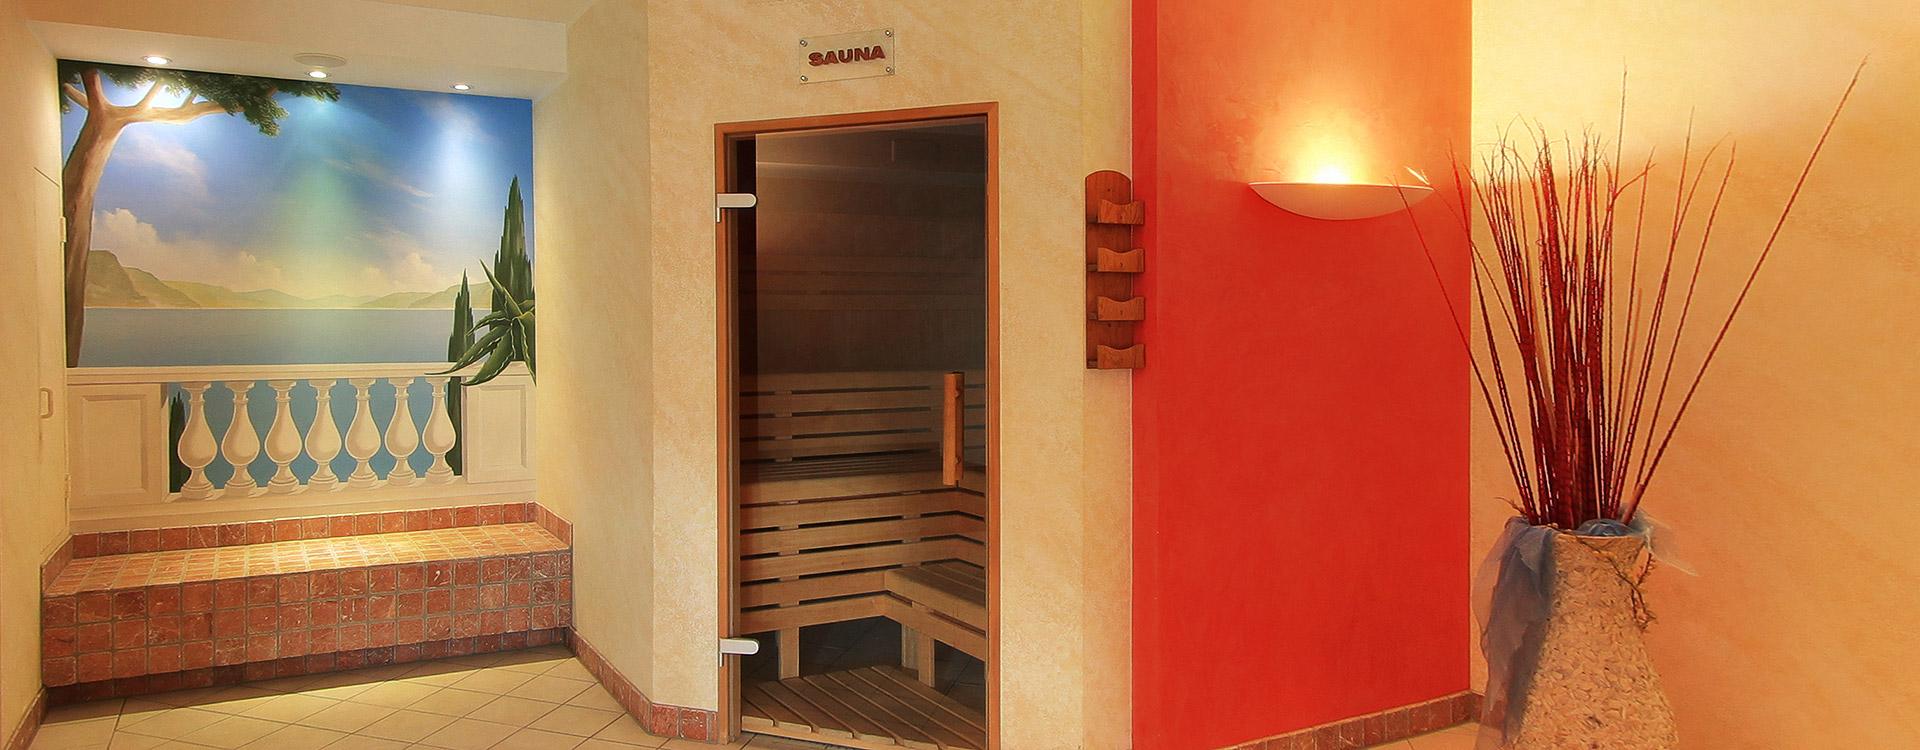 akzent_waldhotel_rheingau_geisenheim_wellness_sauna_01